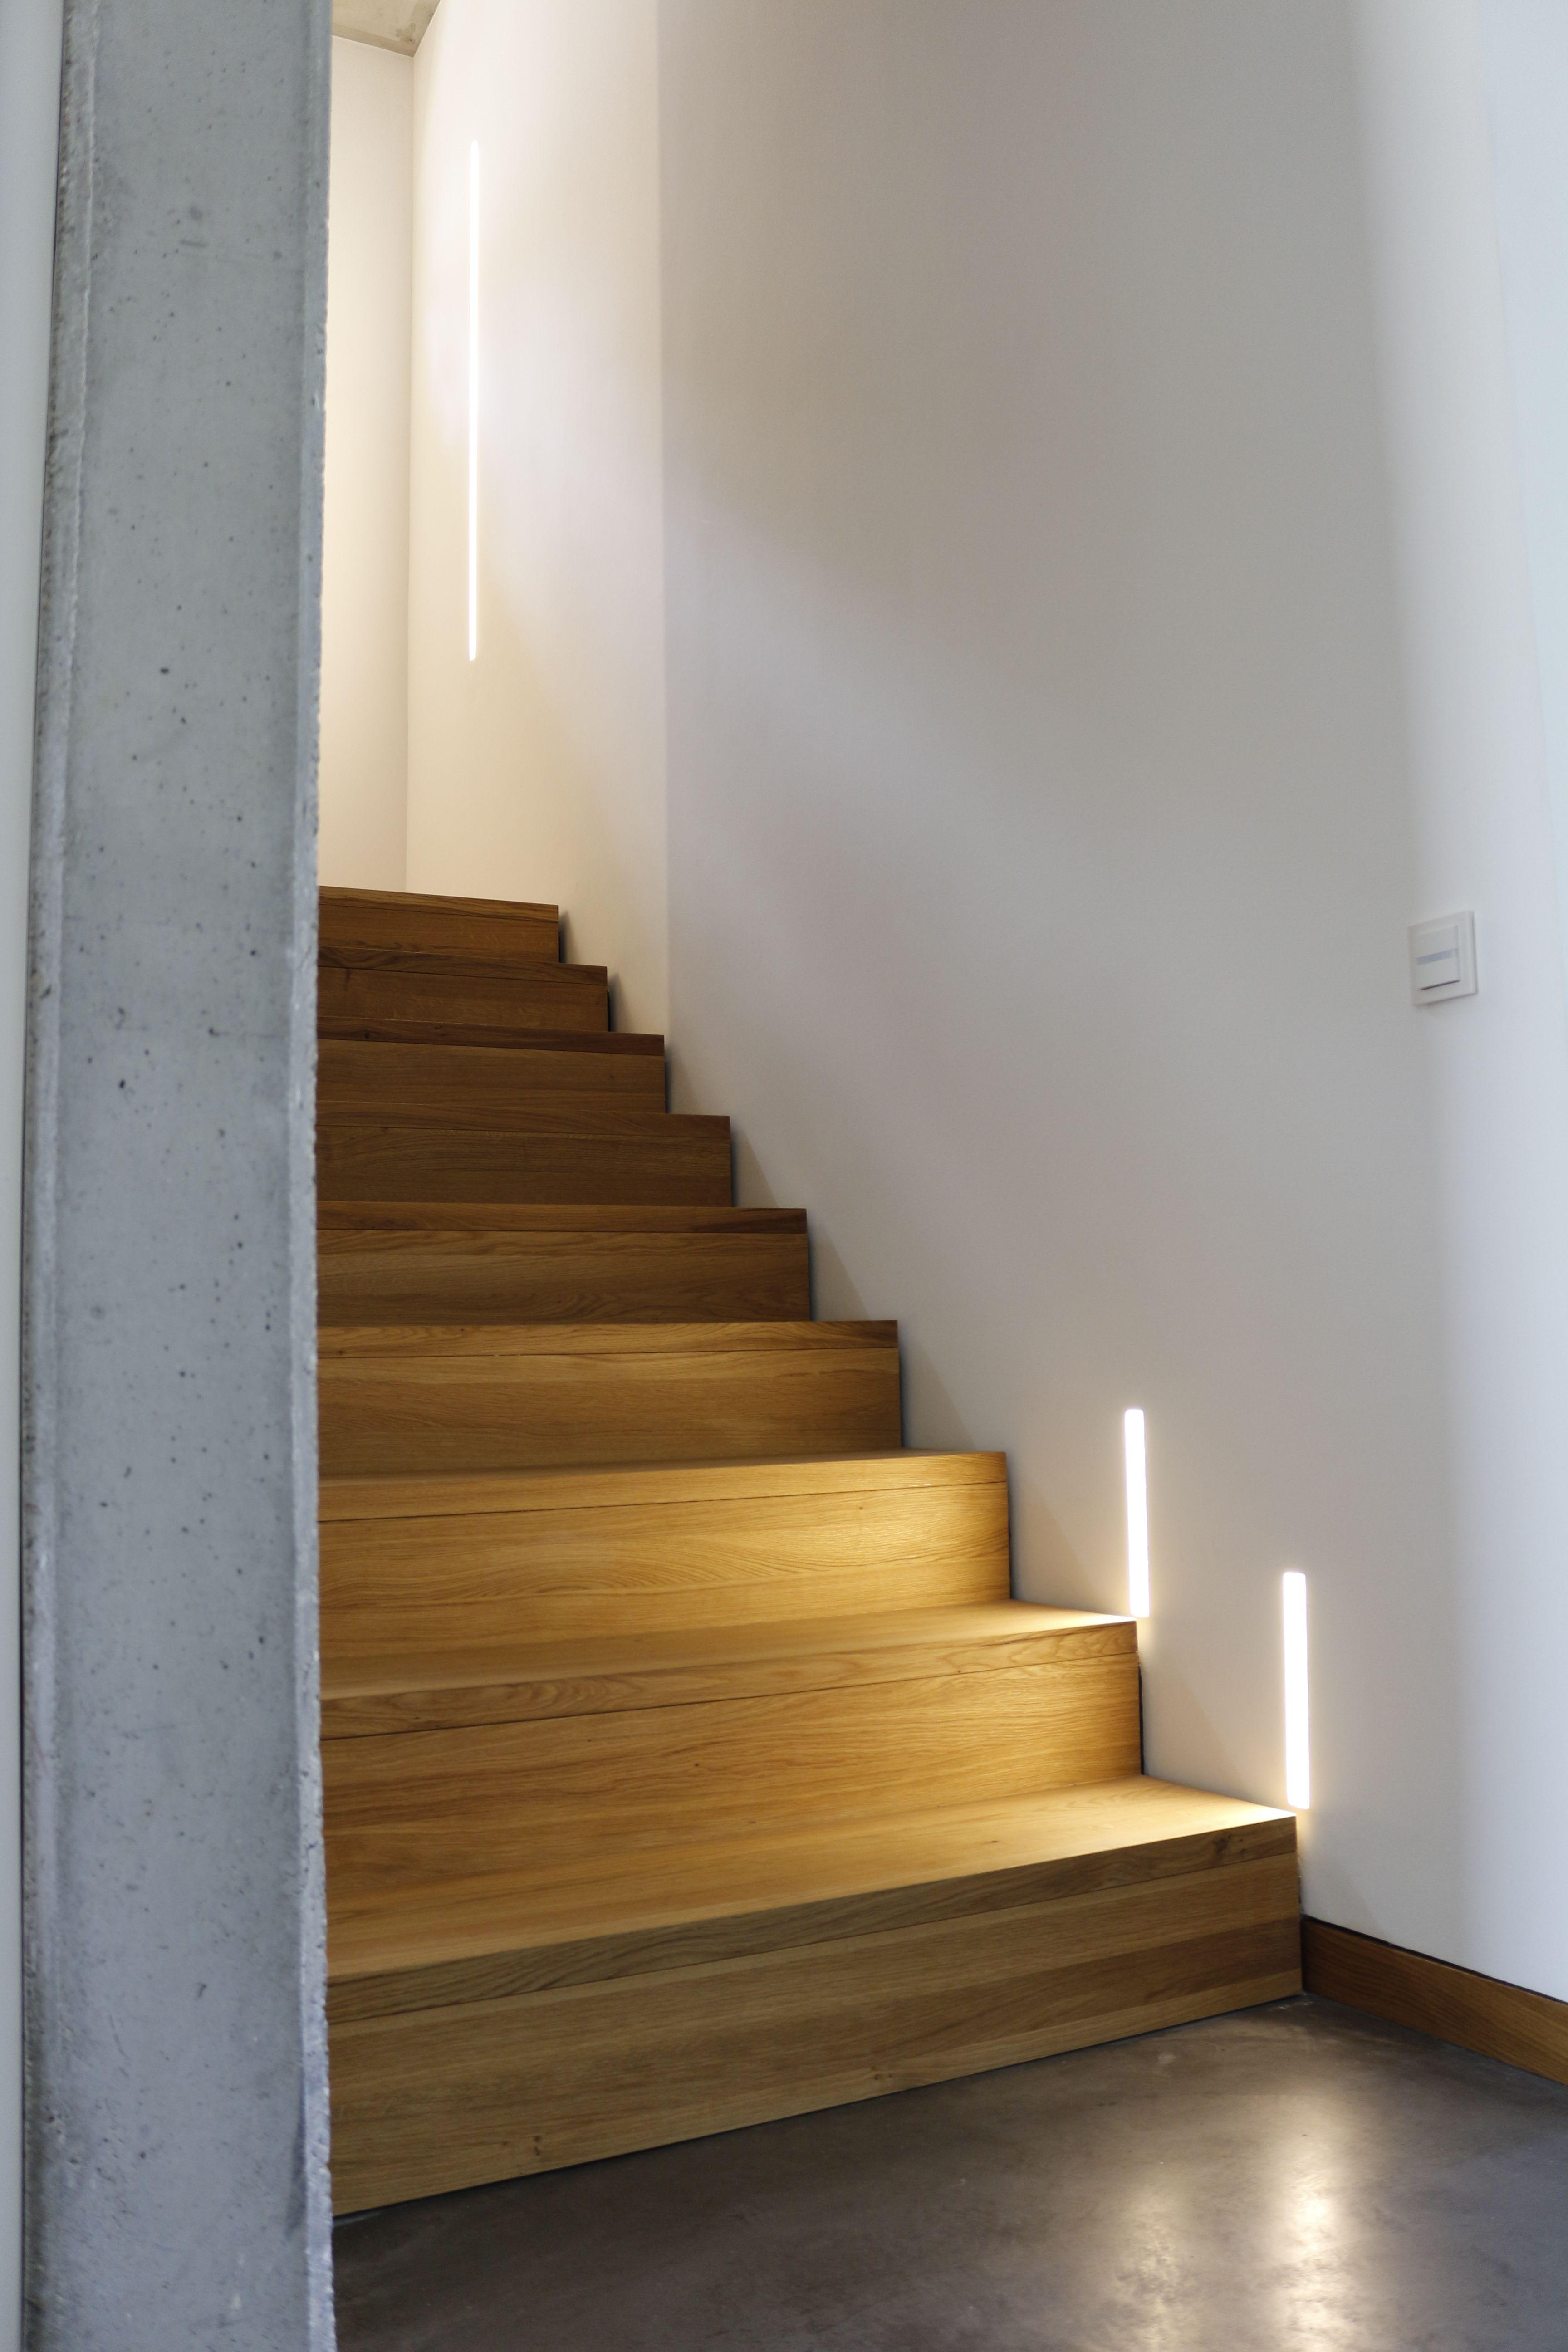 Led Treppenbeleuchtung Www Bender Architektur De Treppenbeleuchtung Led Treppenbeleuchtung Treppenlicht